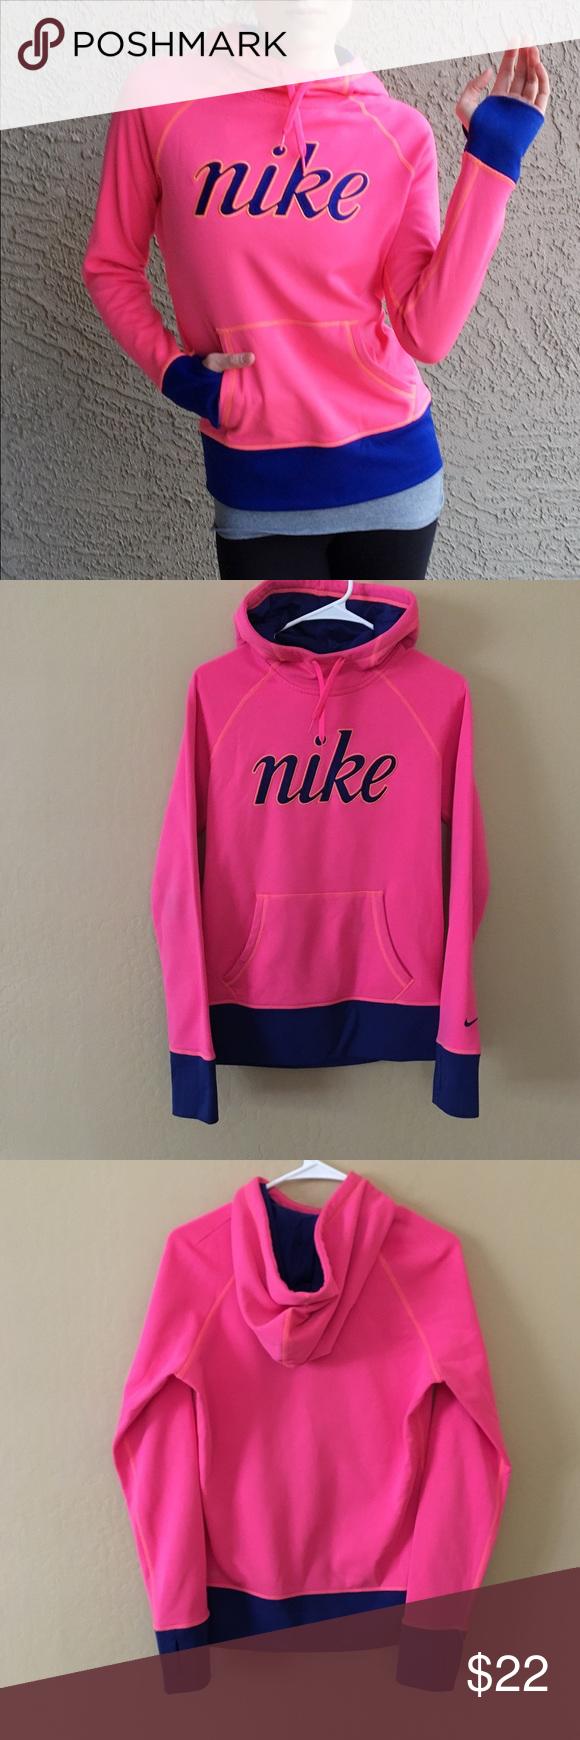 NIKE Hot Pink & Blue Therma Fit Hoodie Workout hoodie